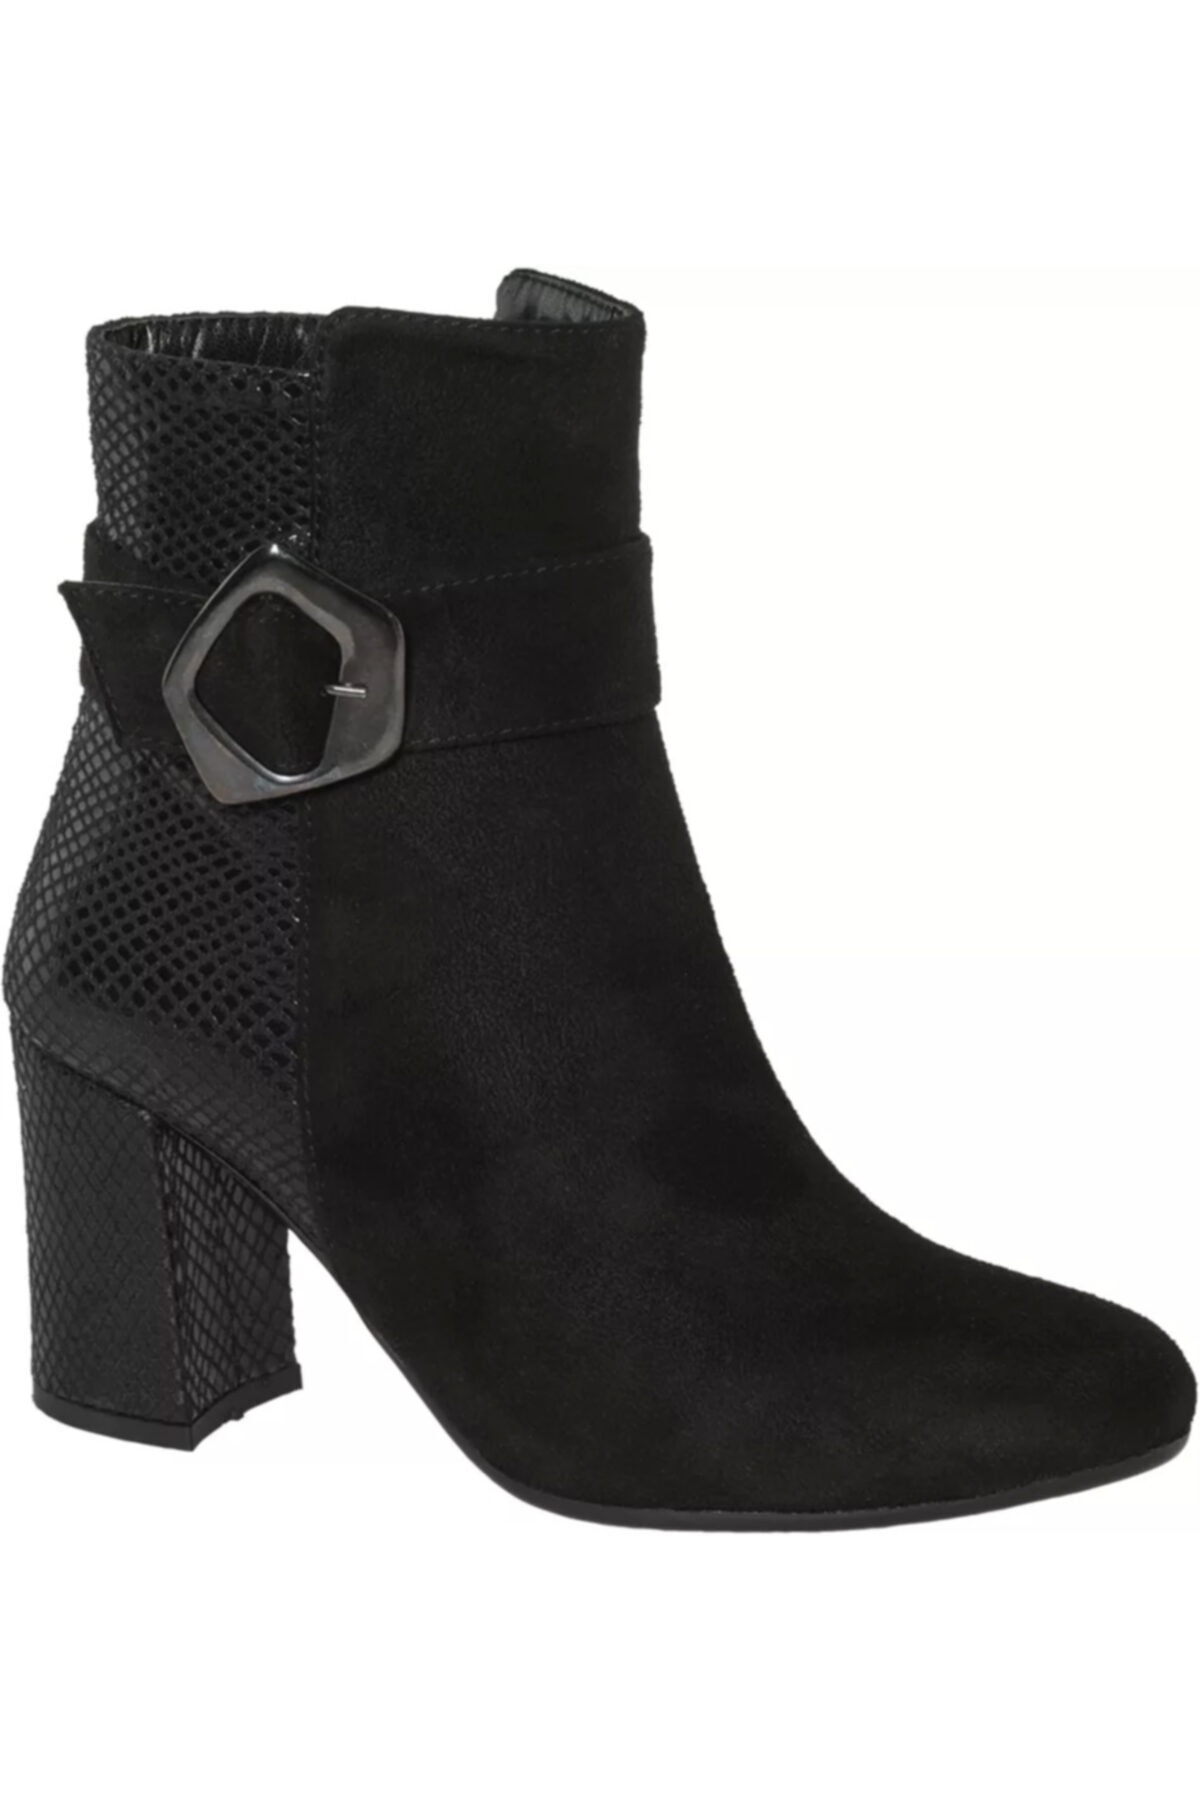 Graceland Deichmann Kadın Siyah Topuklu Bot